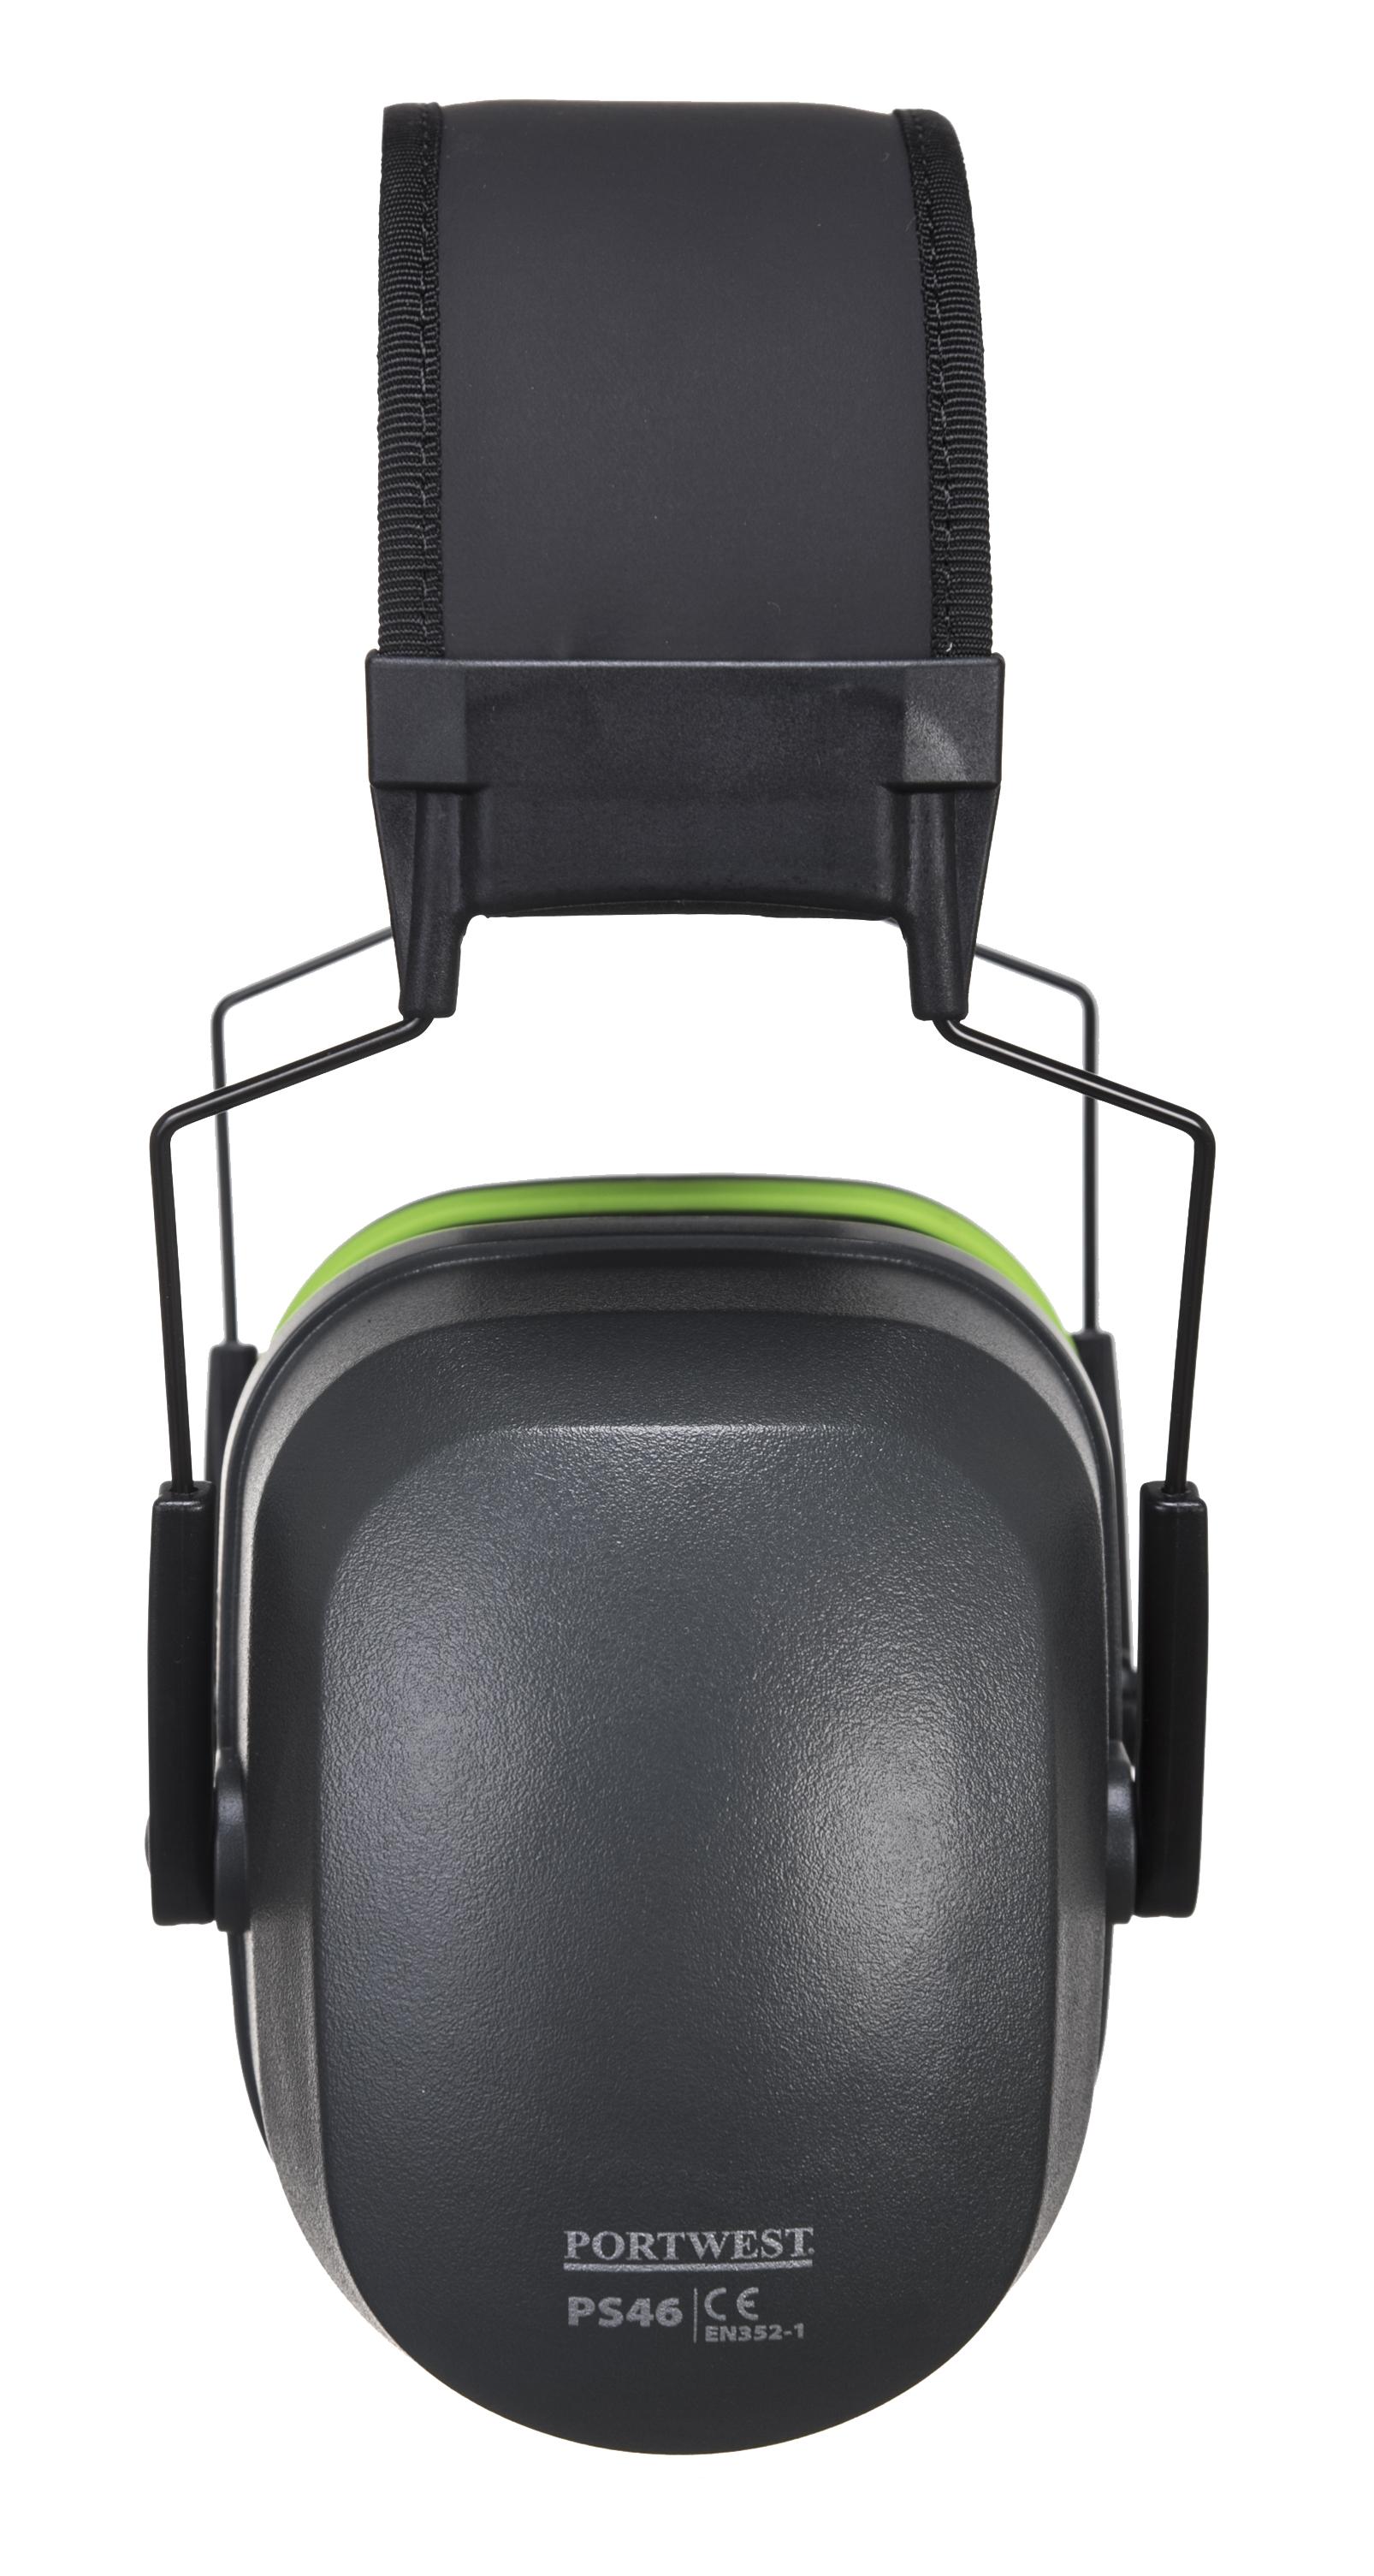 PS46 Portwest Premium Ear Muff